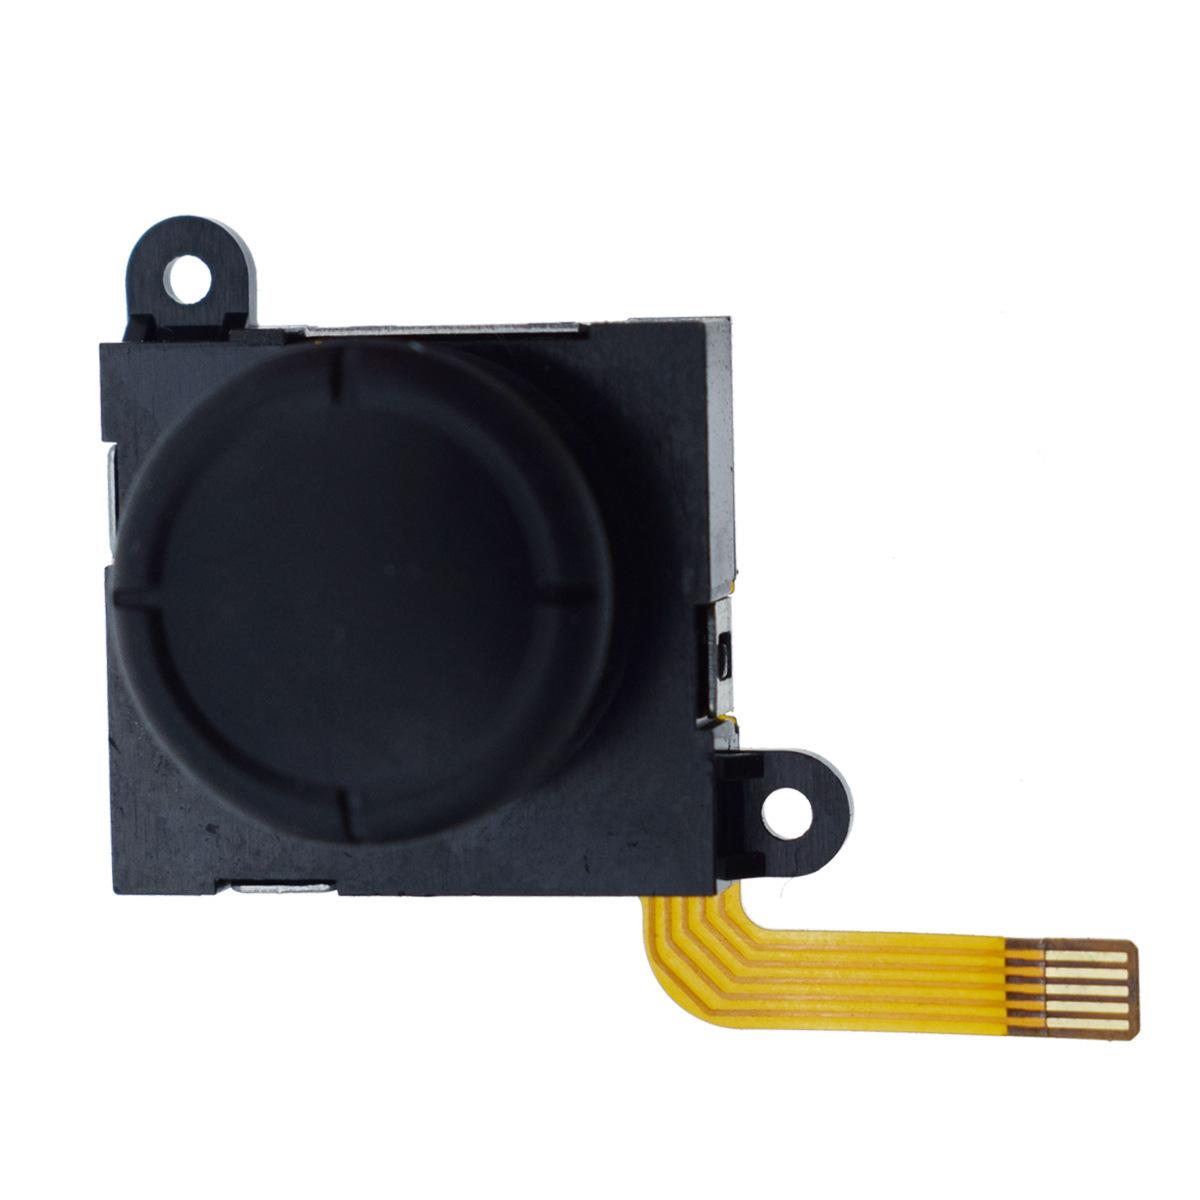 Nintendo Switch Joy-Con用 交換用アナログスティック 単品販売 スティックキャップ付 ブラック L/R兼用